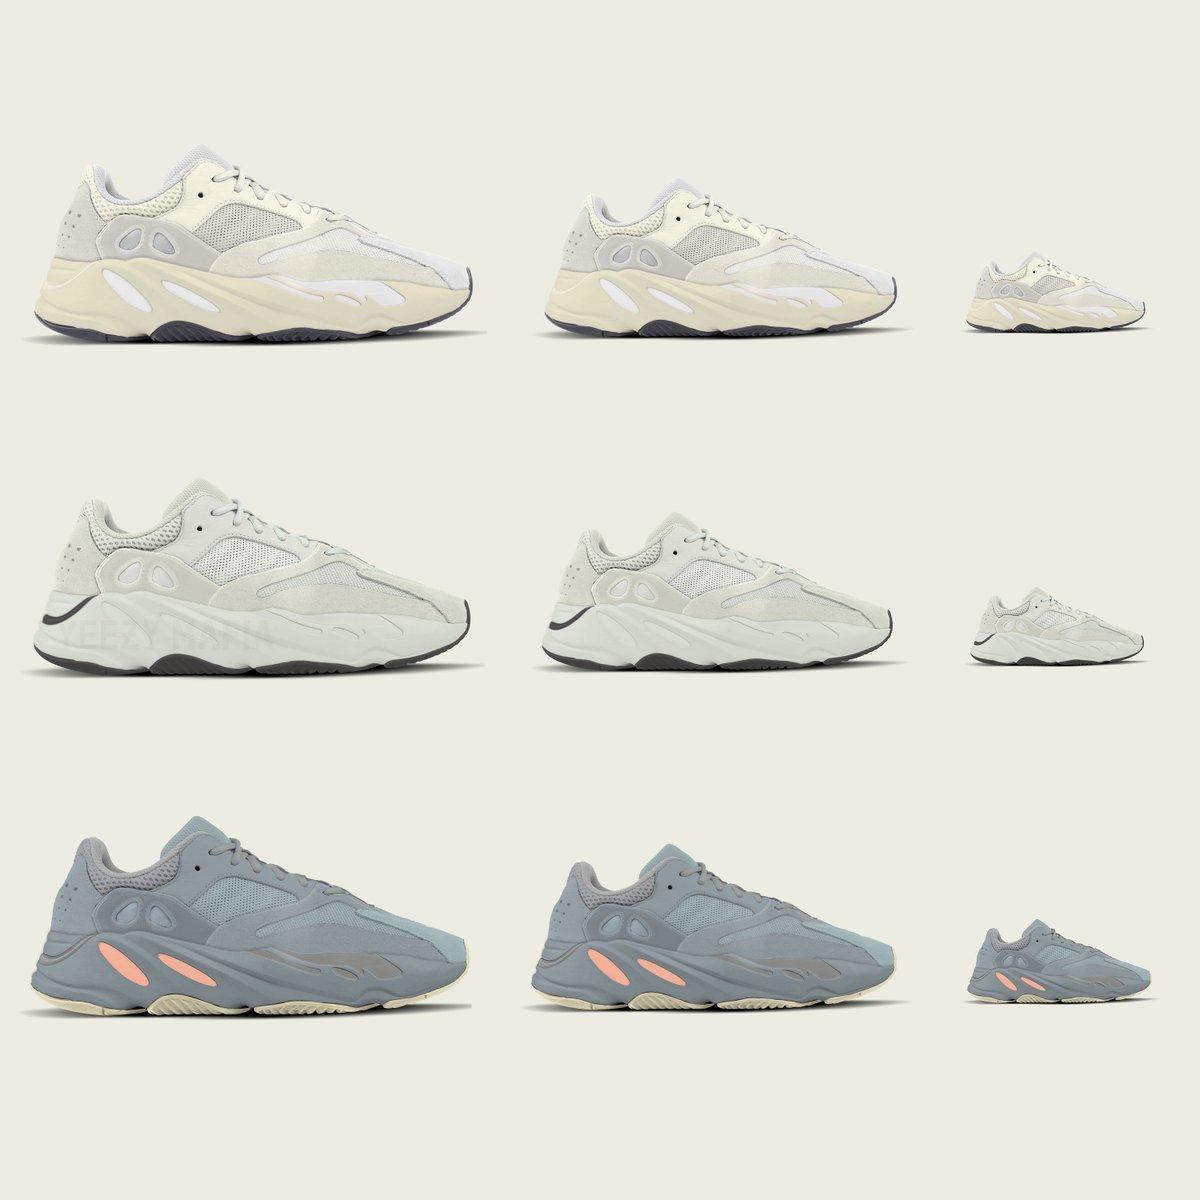 adidas yeezy kids shoes